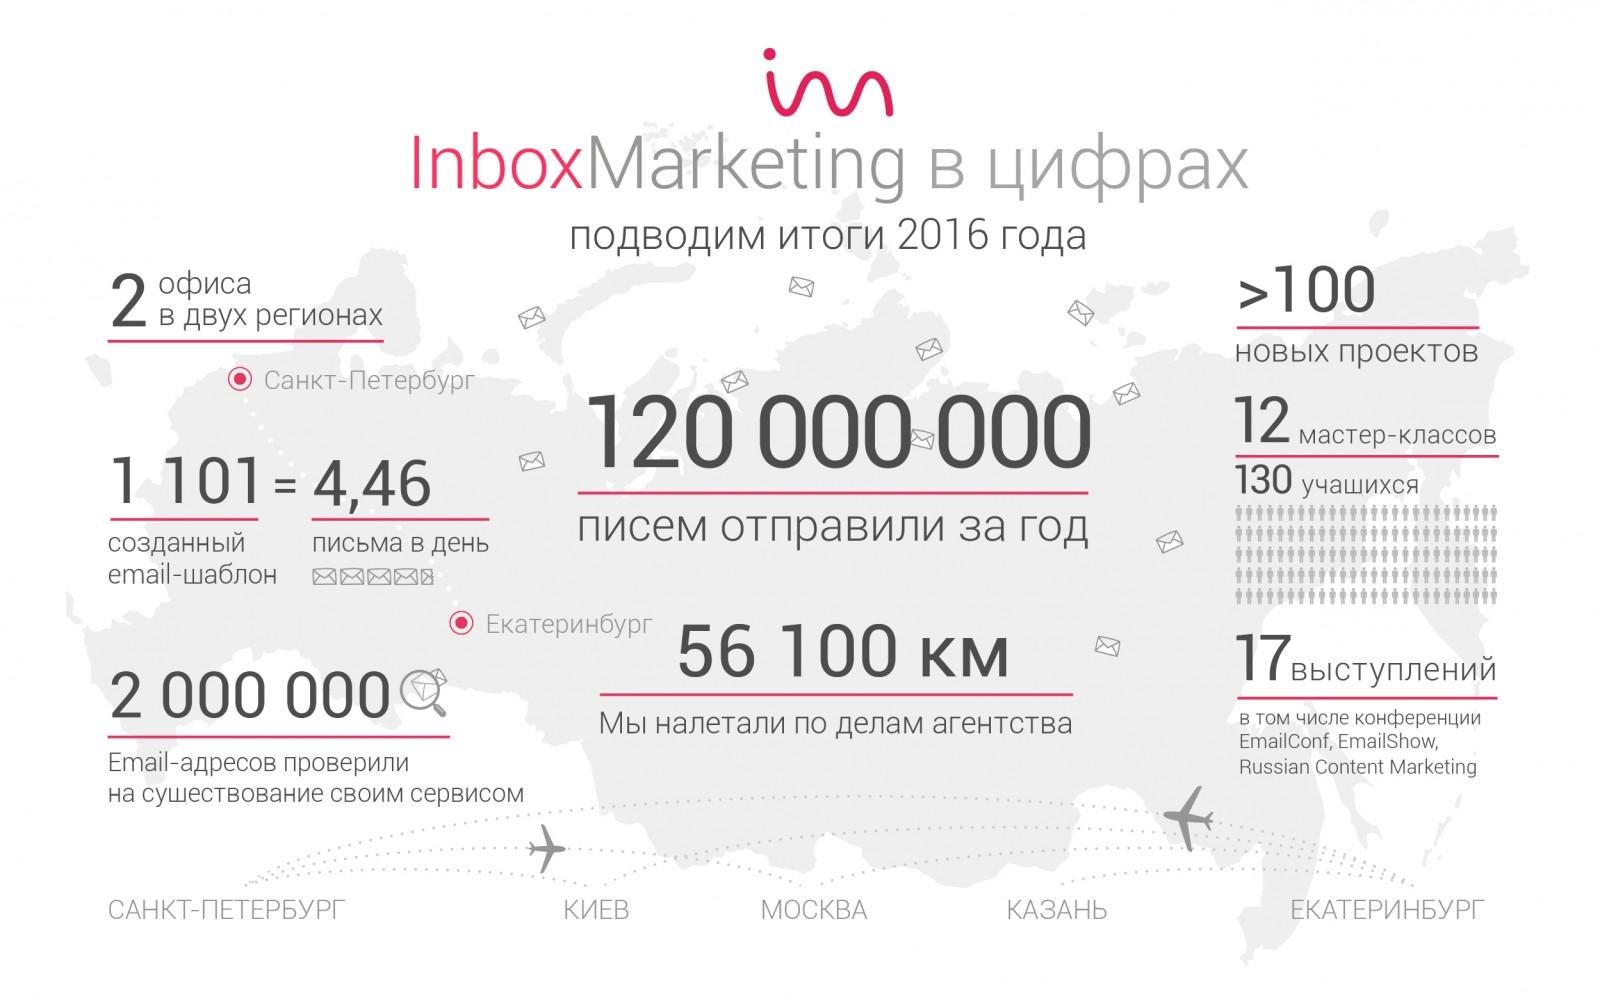 Inbox Marketing в цифрах